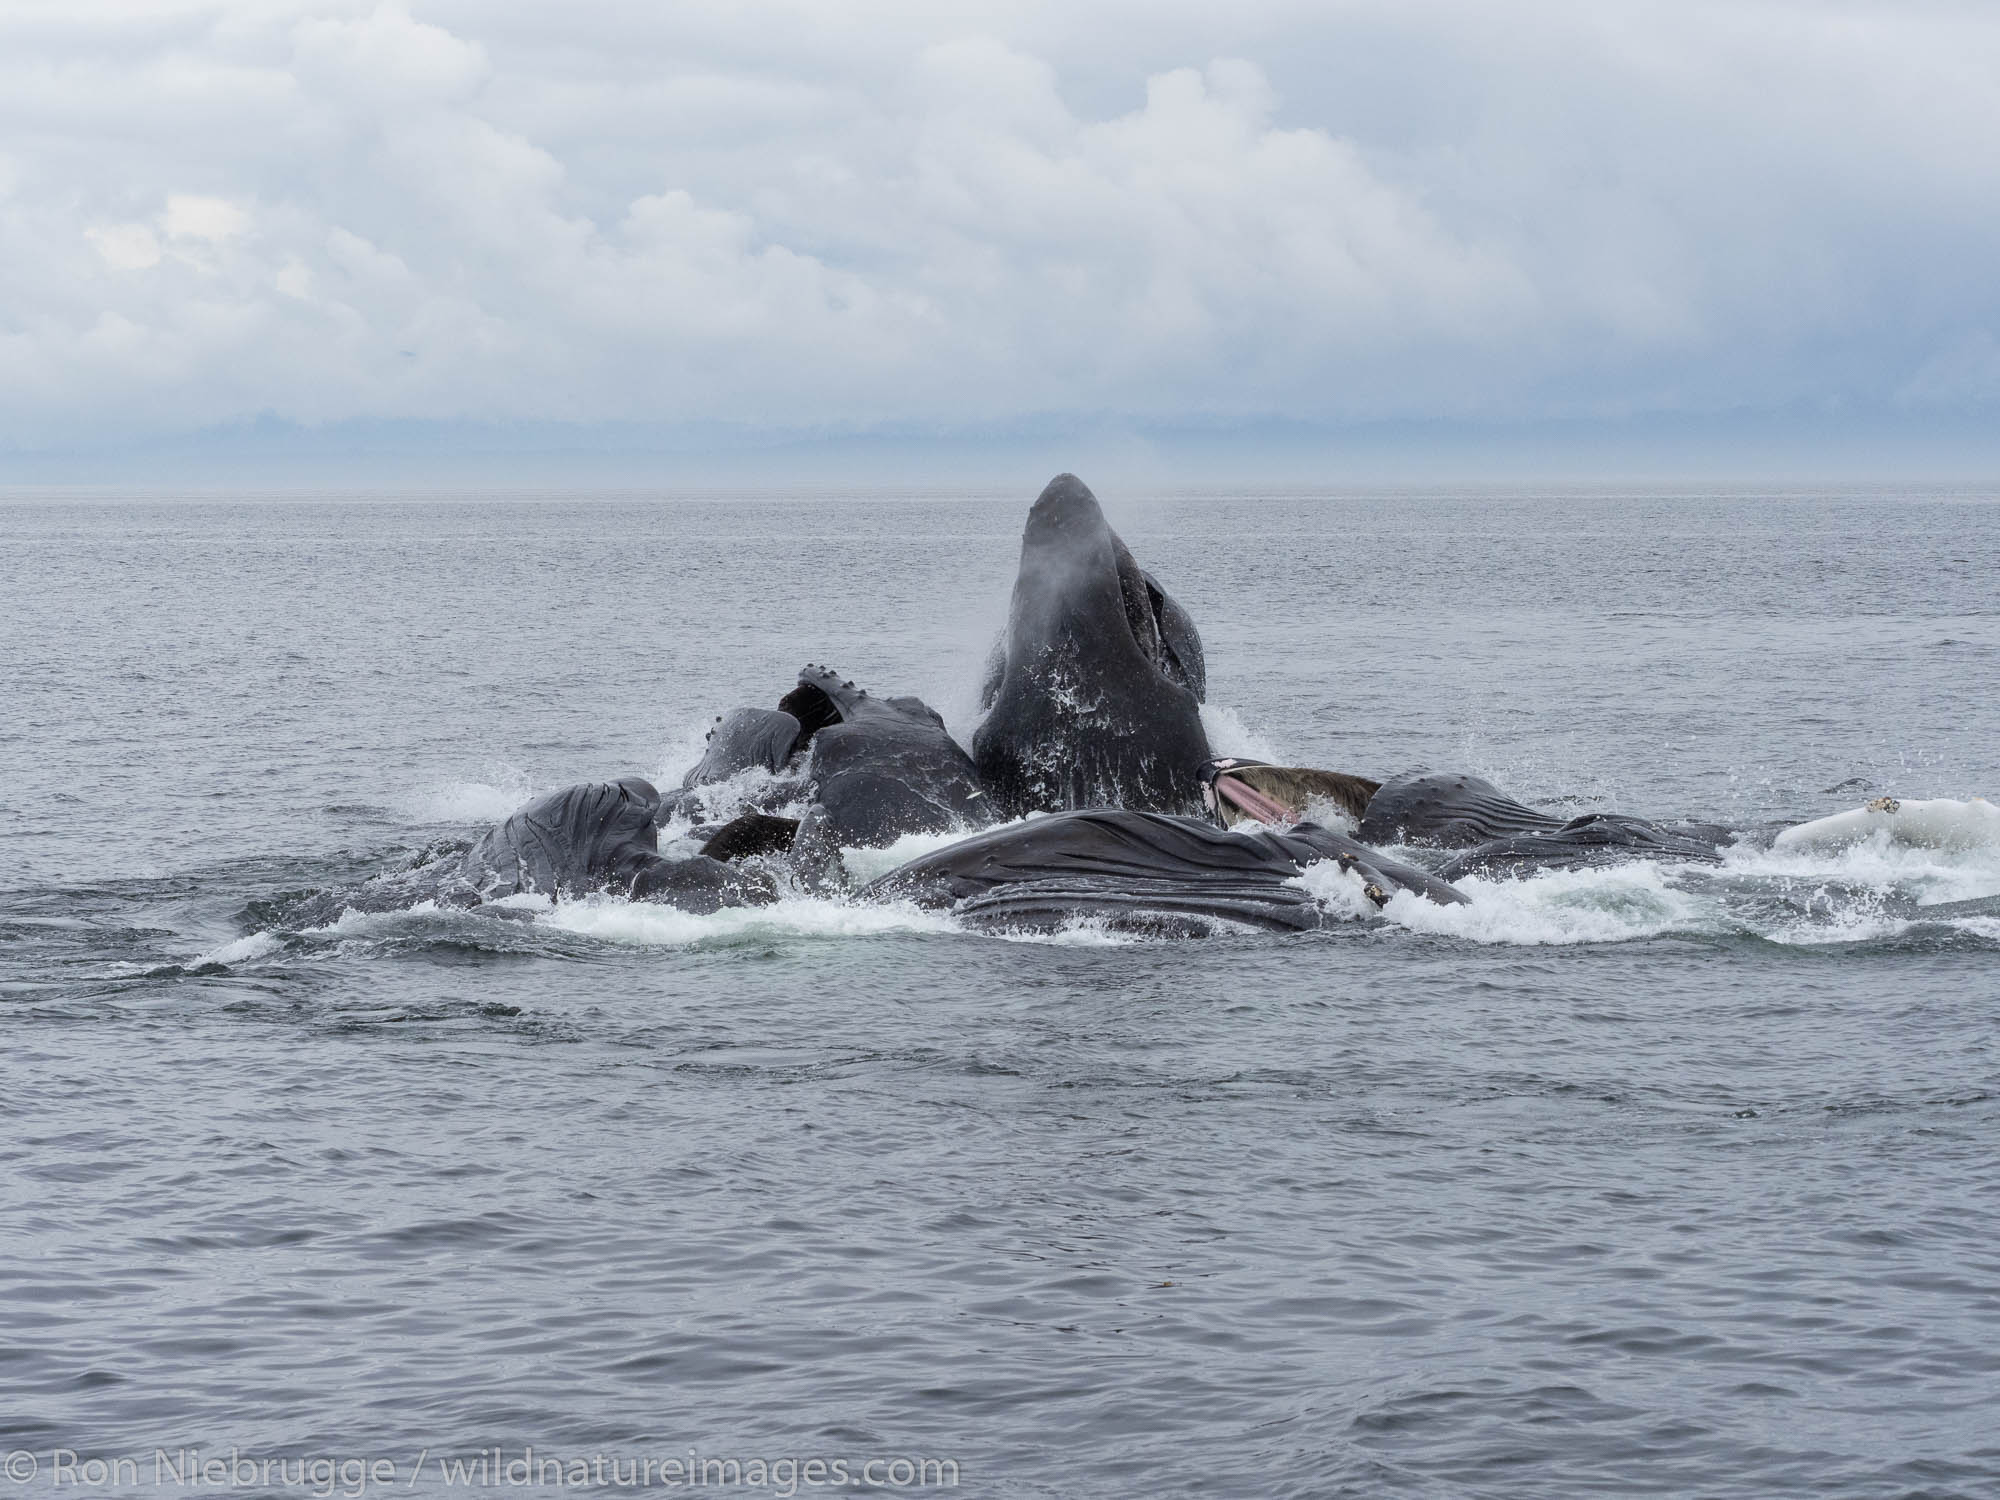 Bubble-net feeding humpback whales, Tongass National Forest, Alaska.